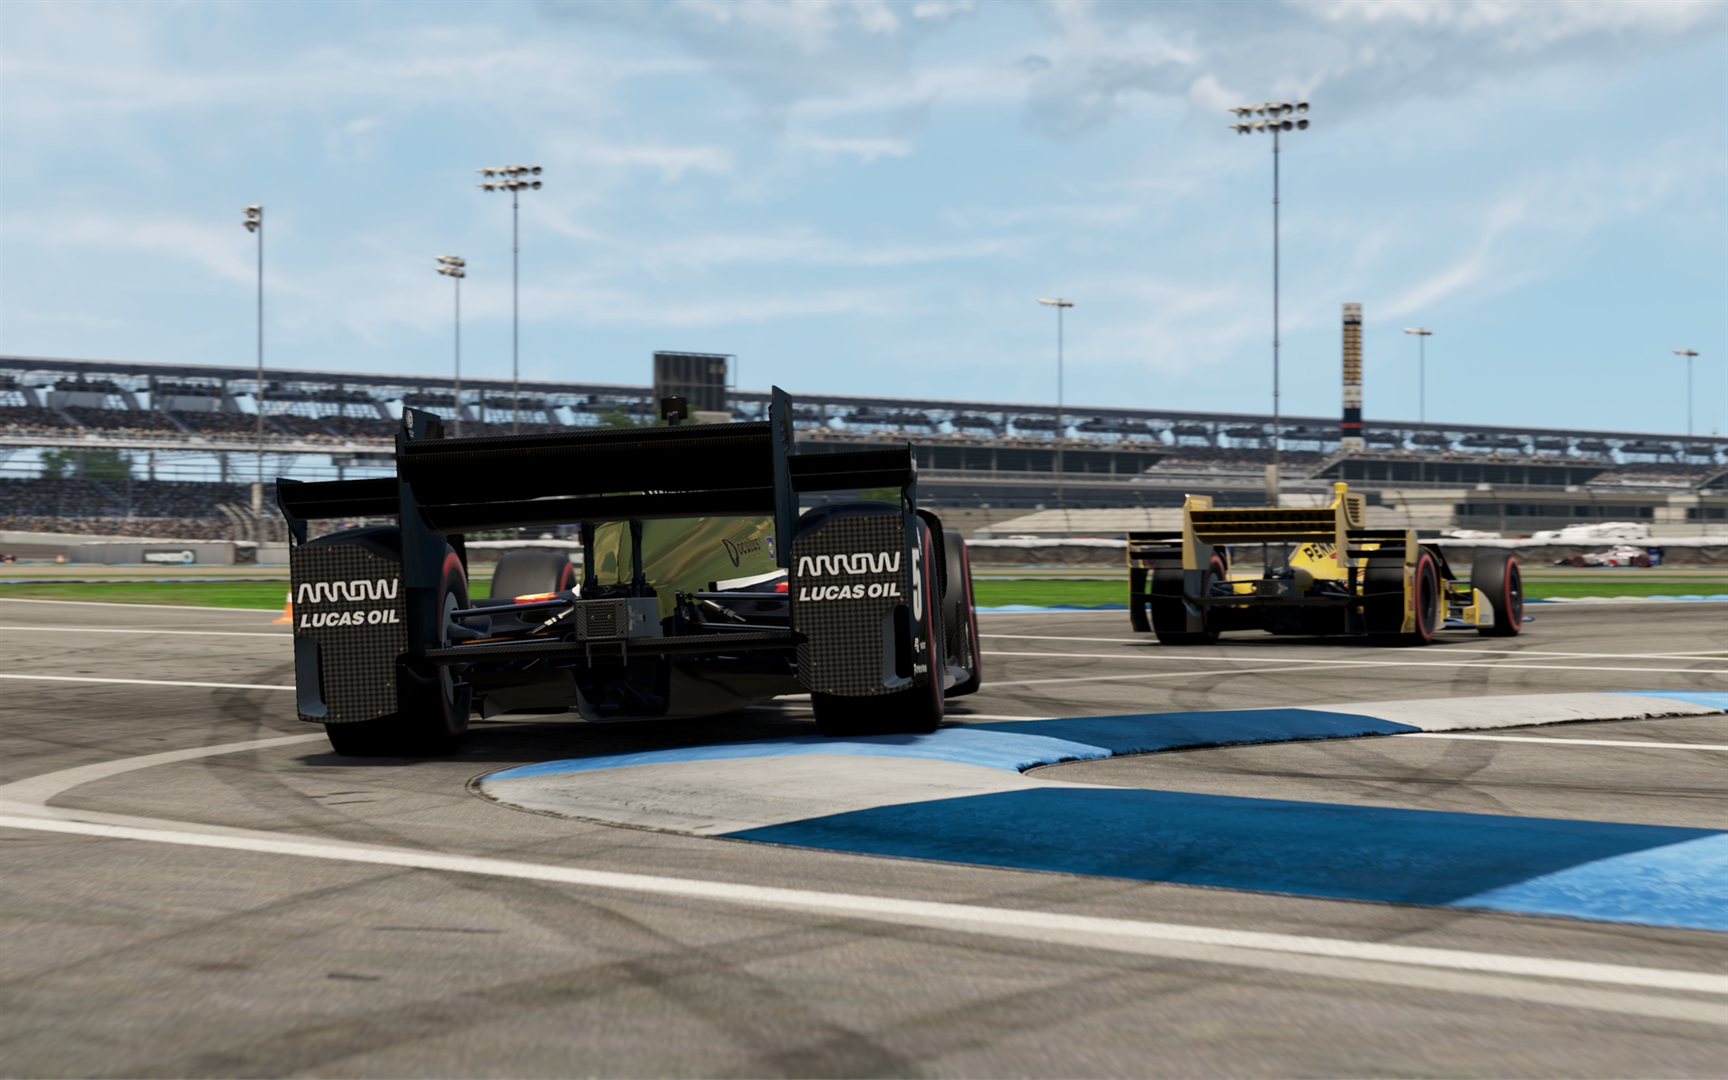 More Project CARS 2 Screenshots